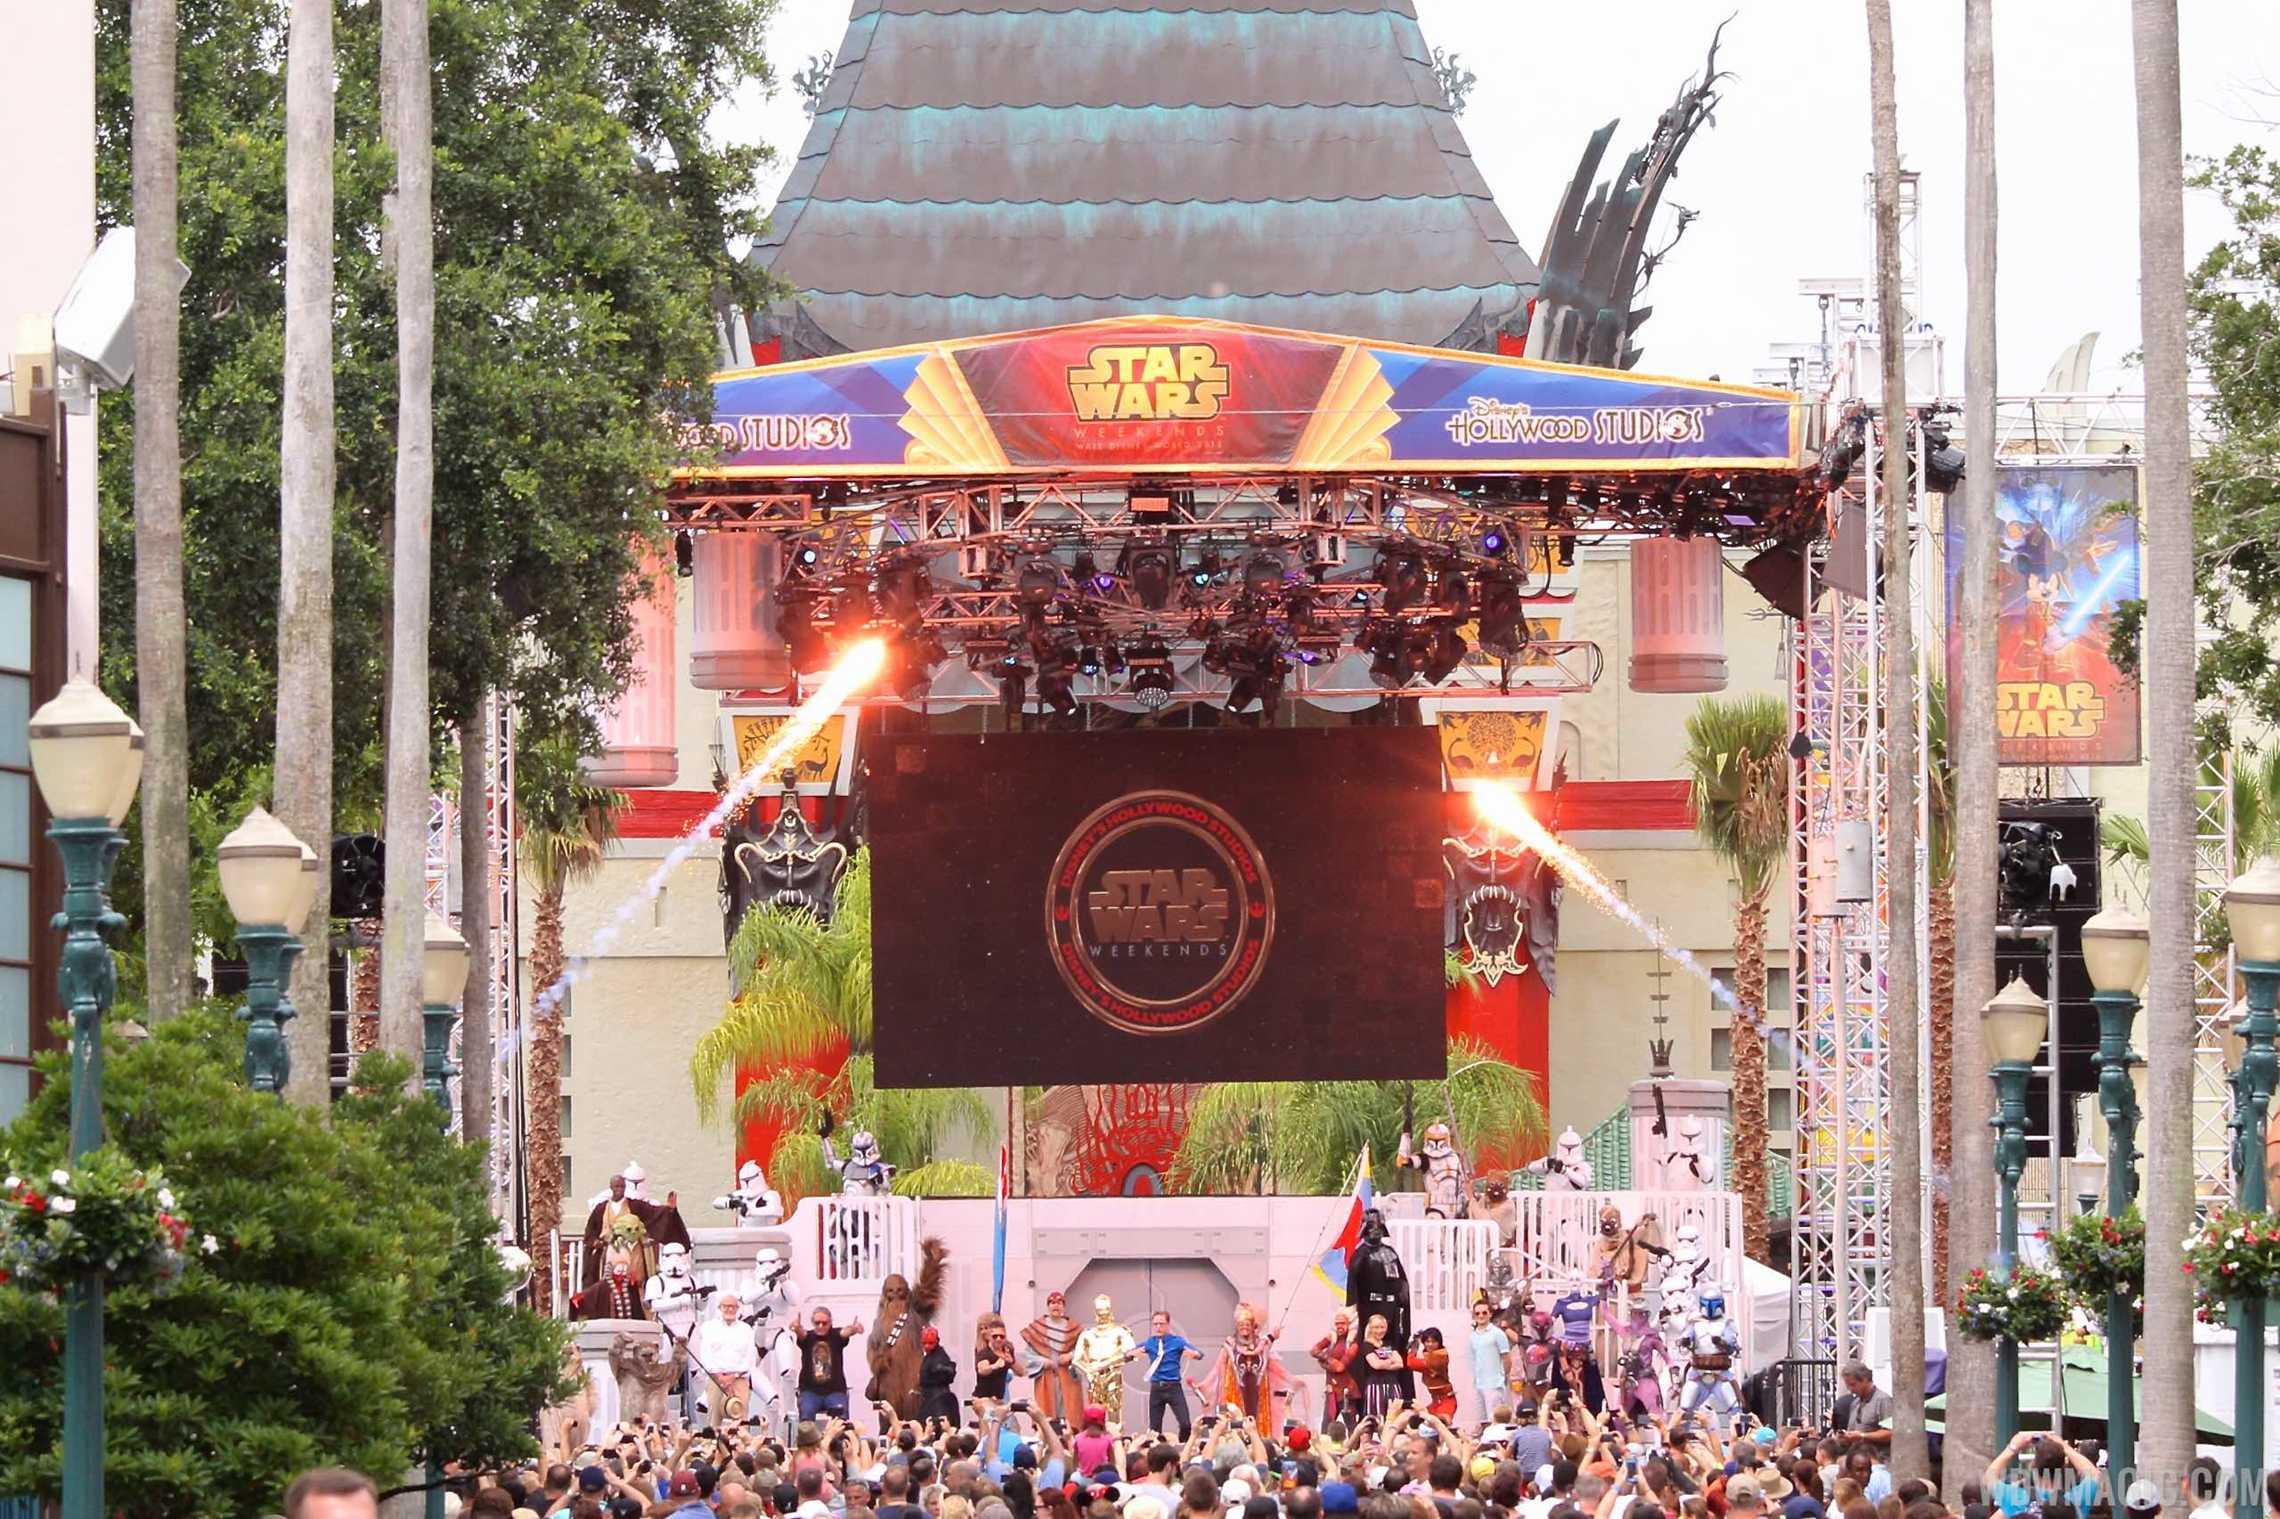 2015 Star Wars Weekends - Weekend 5 Legends of the Force motorcade celebrities - Celebrity Welcome